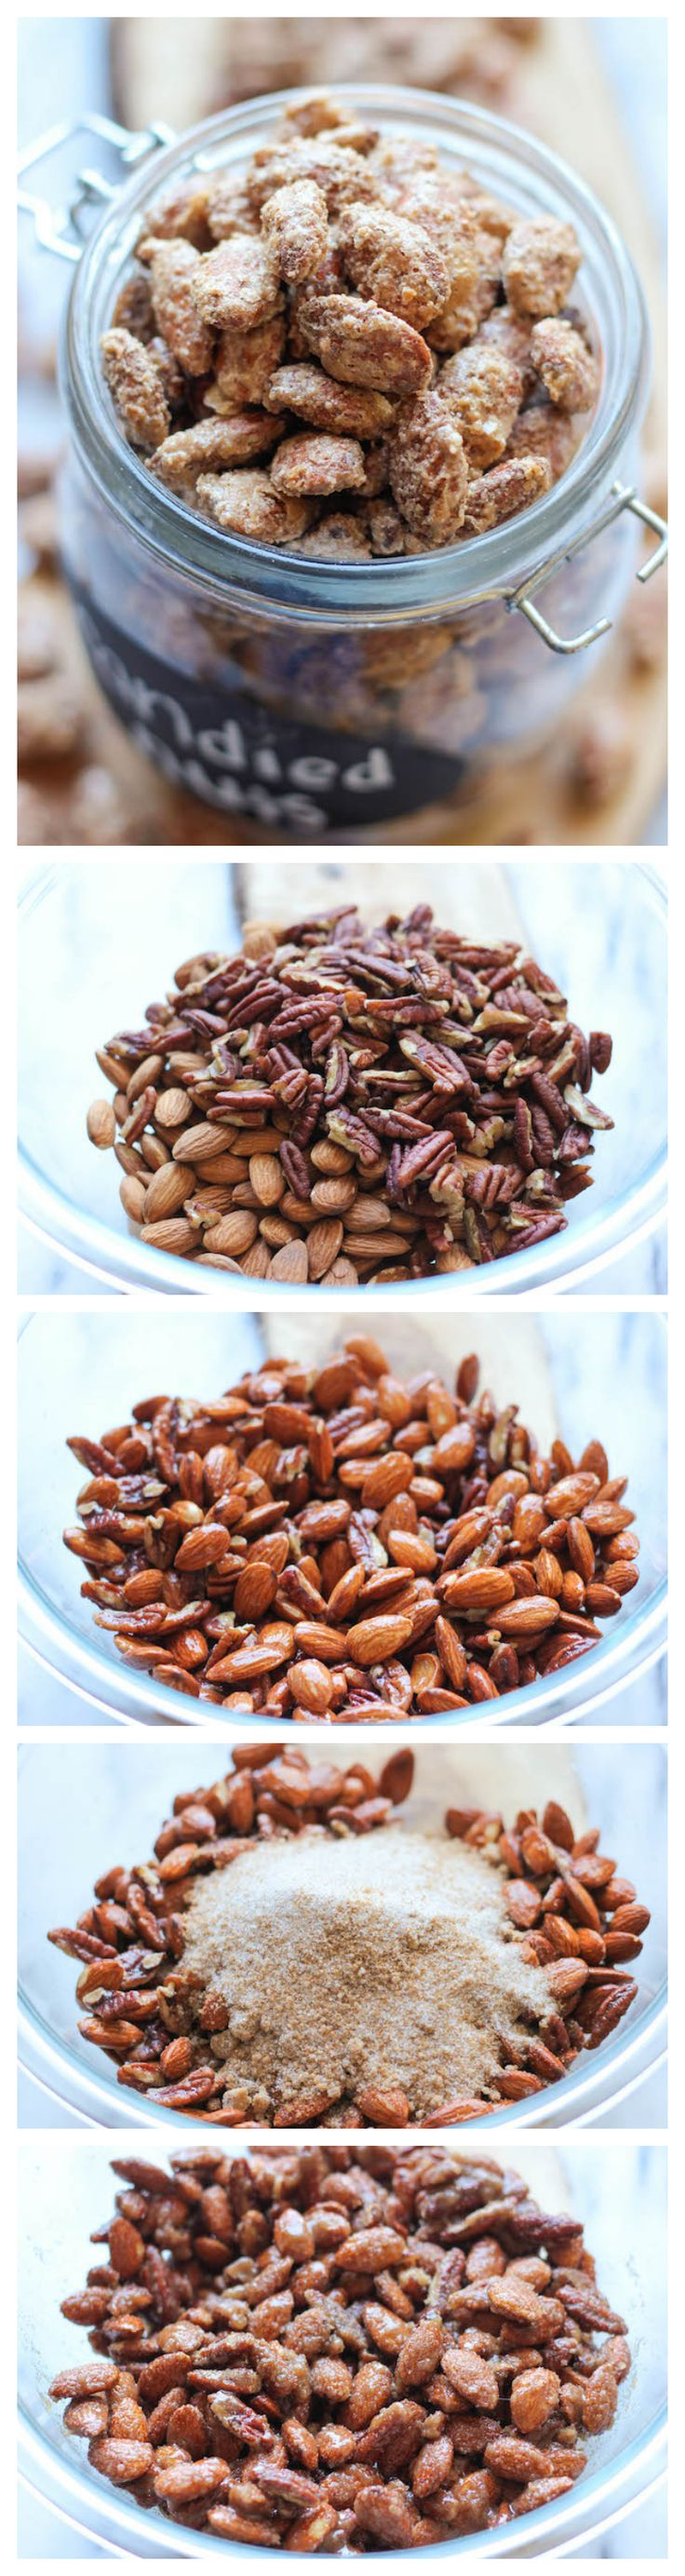 Cinnamon Sugar Can d Nuts